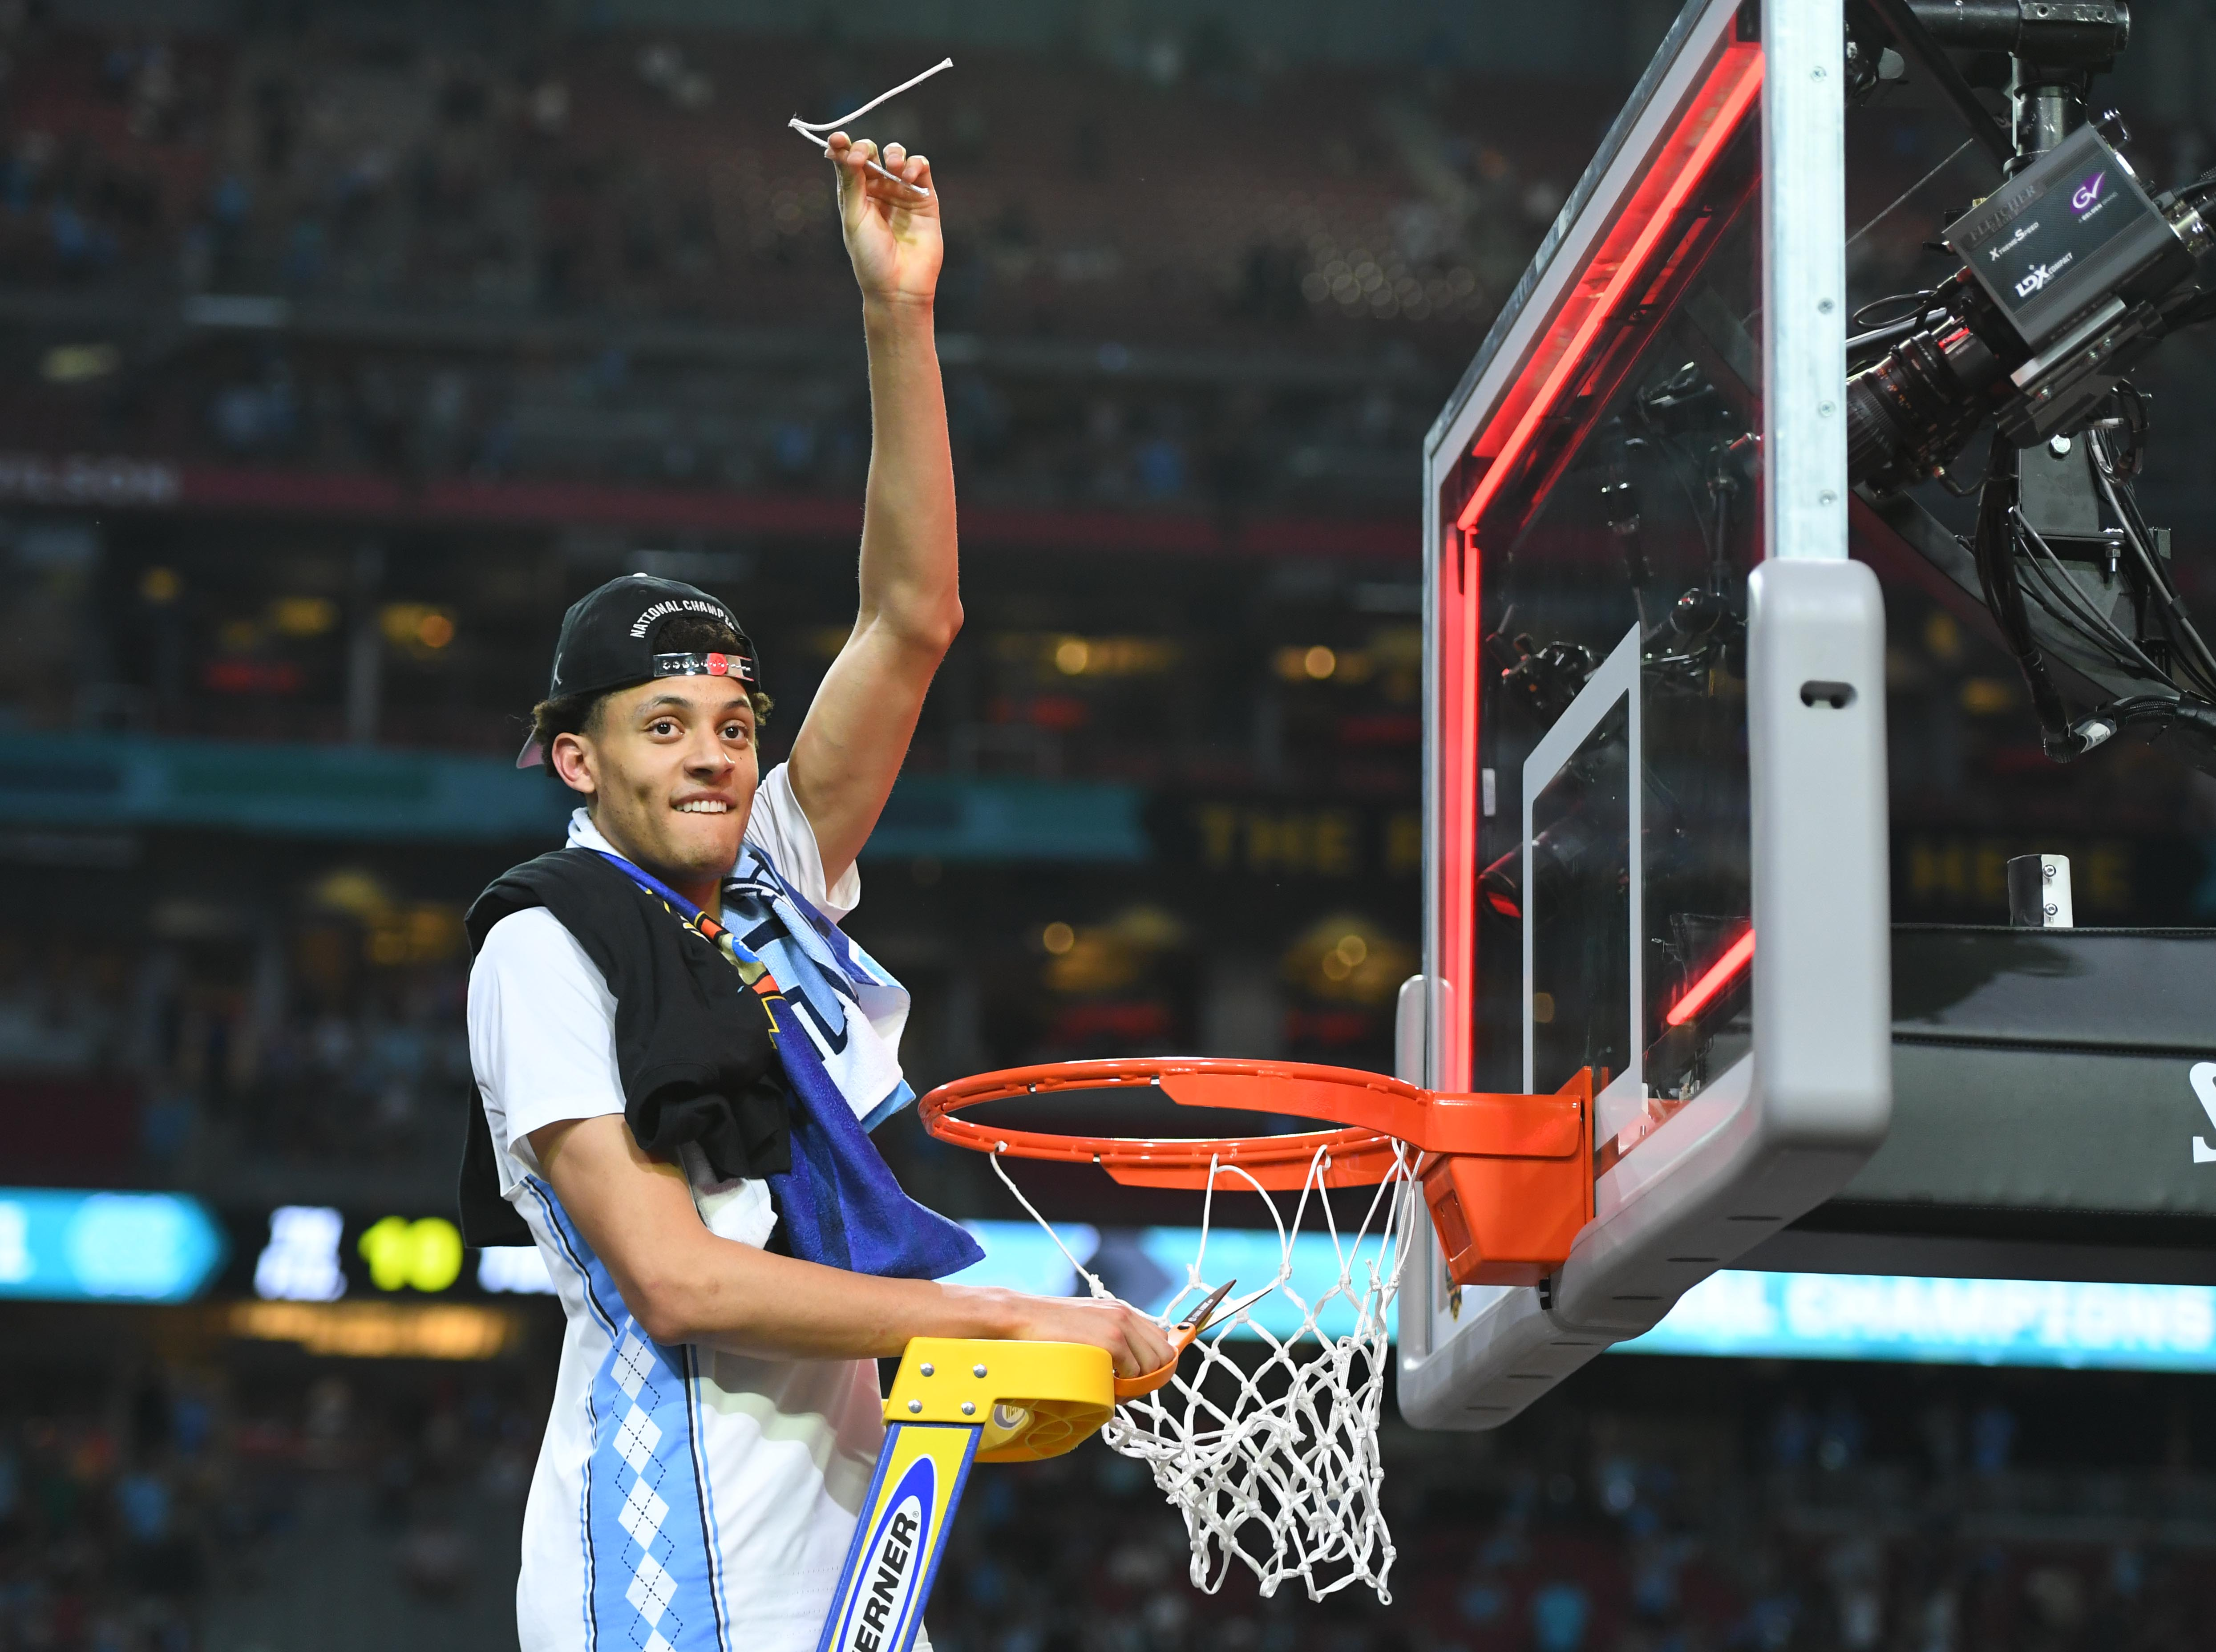 9992253-ncaa-basketball-final-four-championship-game-gonzaga-vs-north-carolina